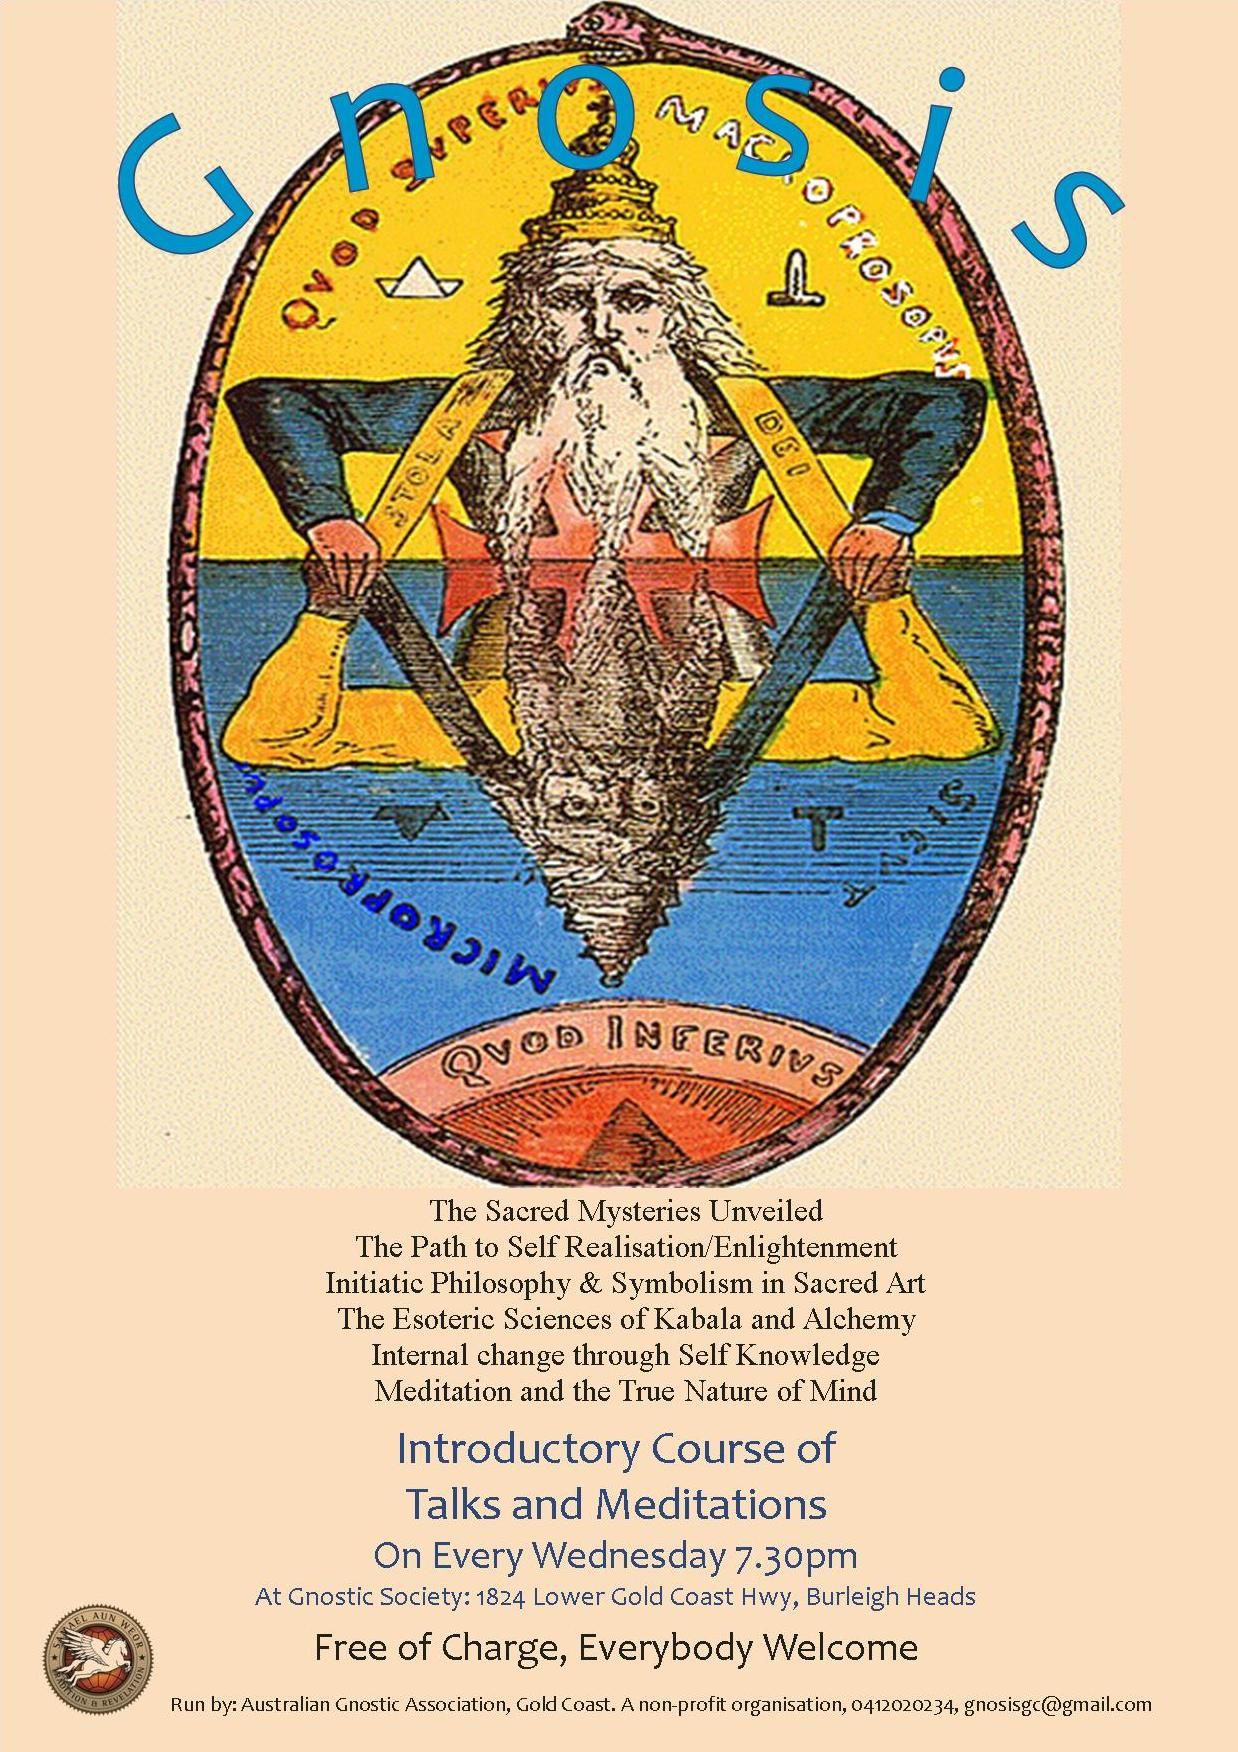 Samael Gnostic